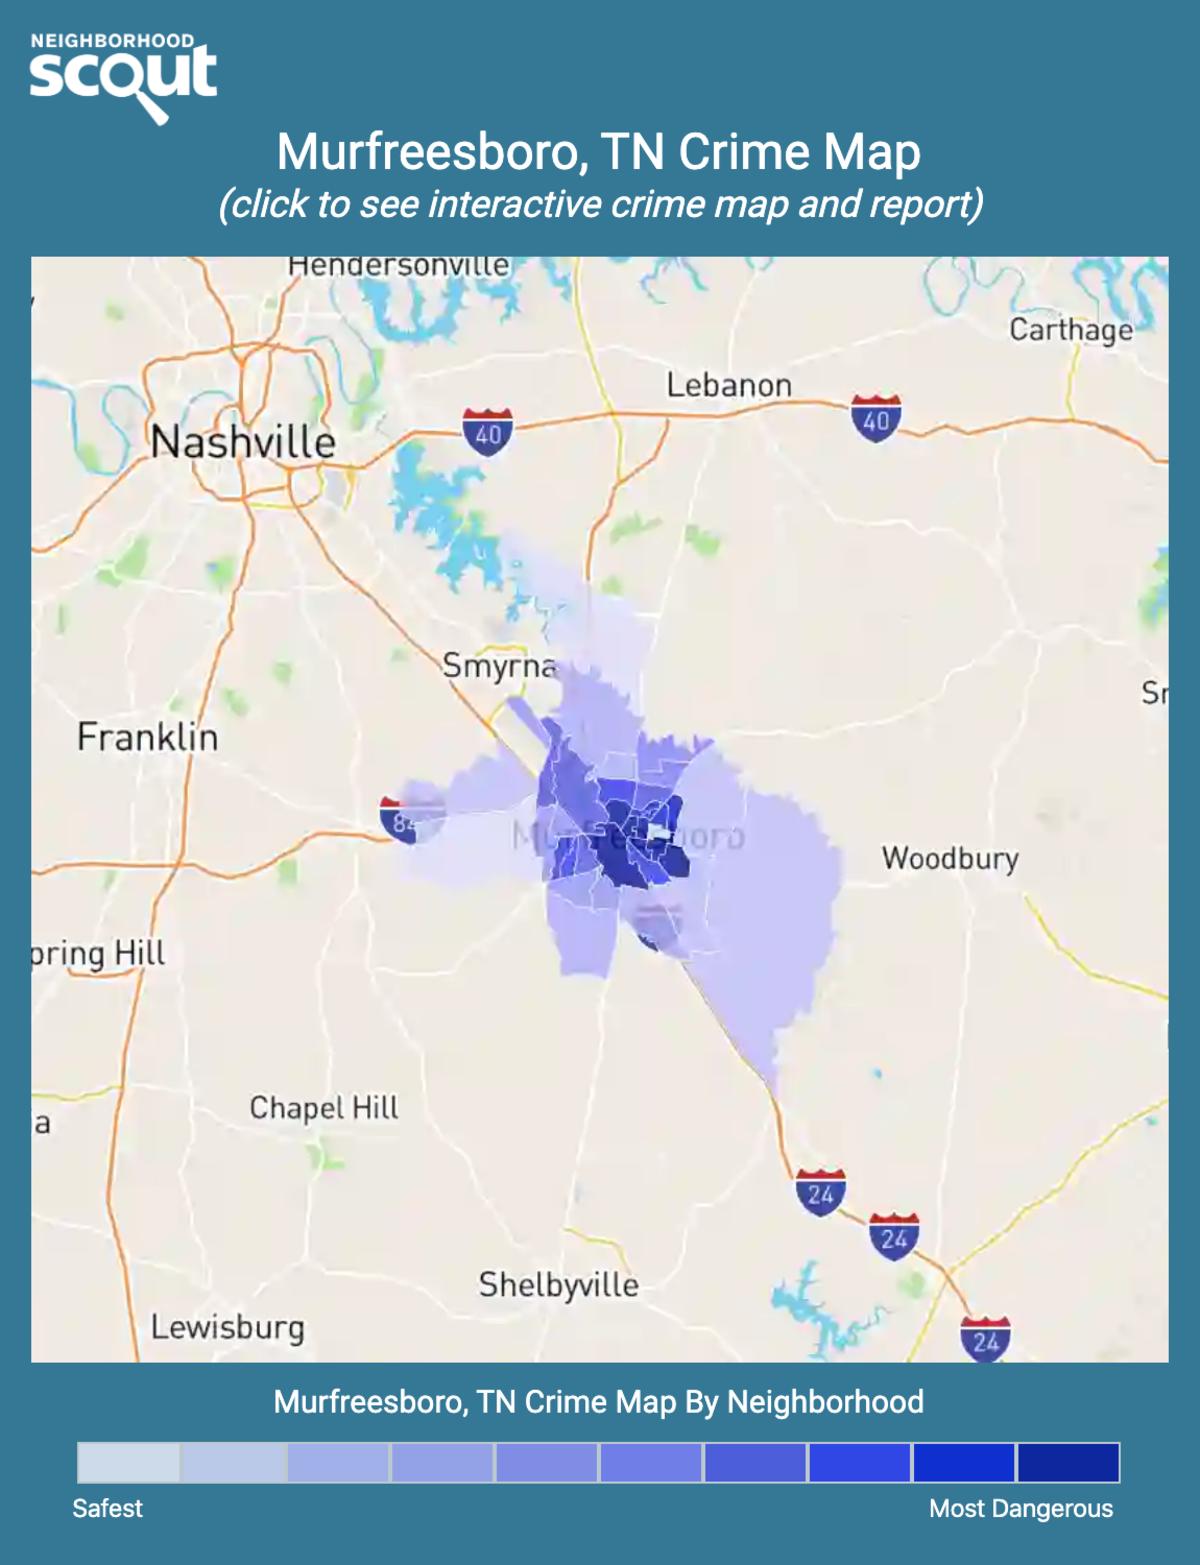 Murfreesboro, Tennessee crime map